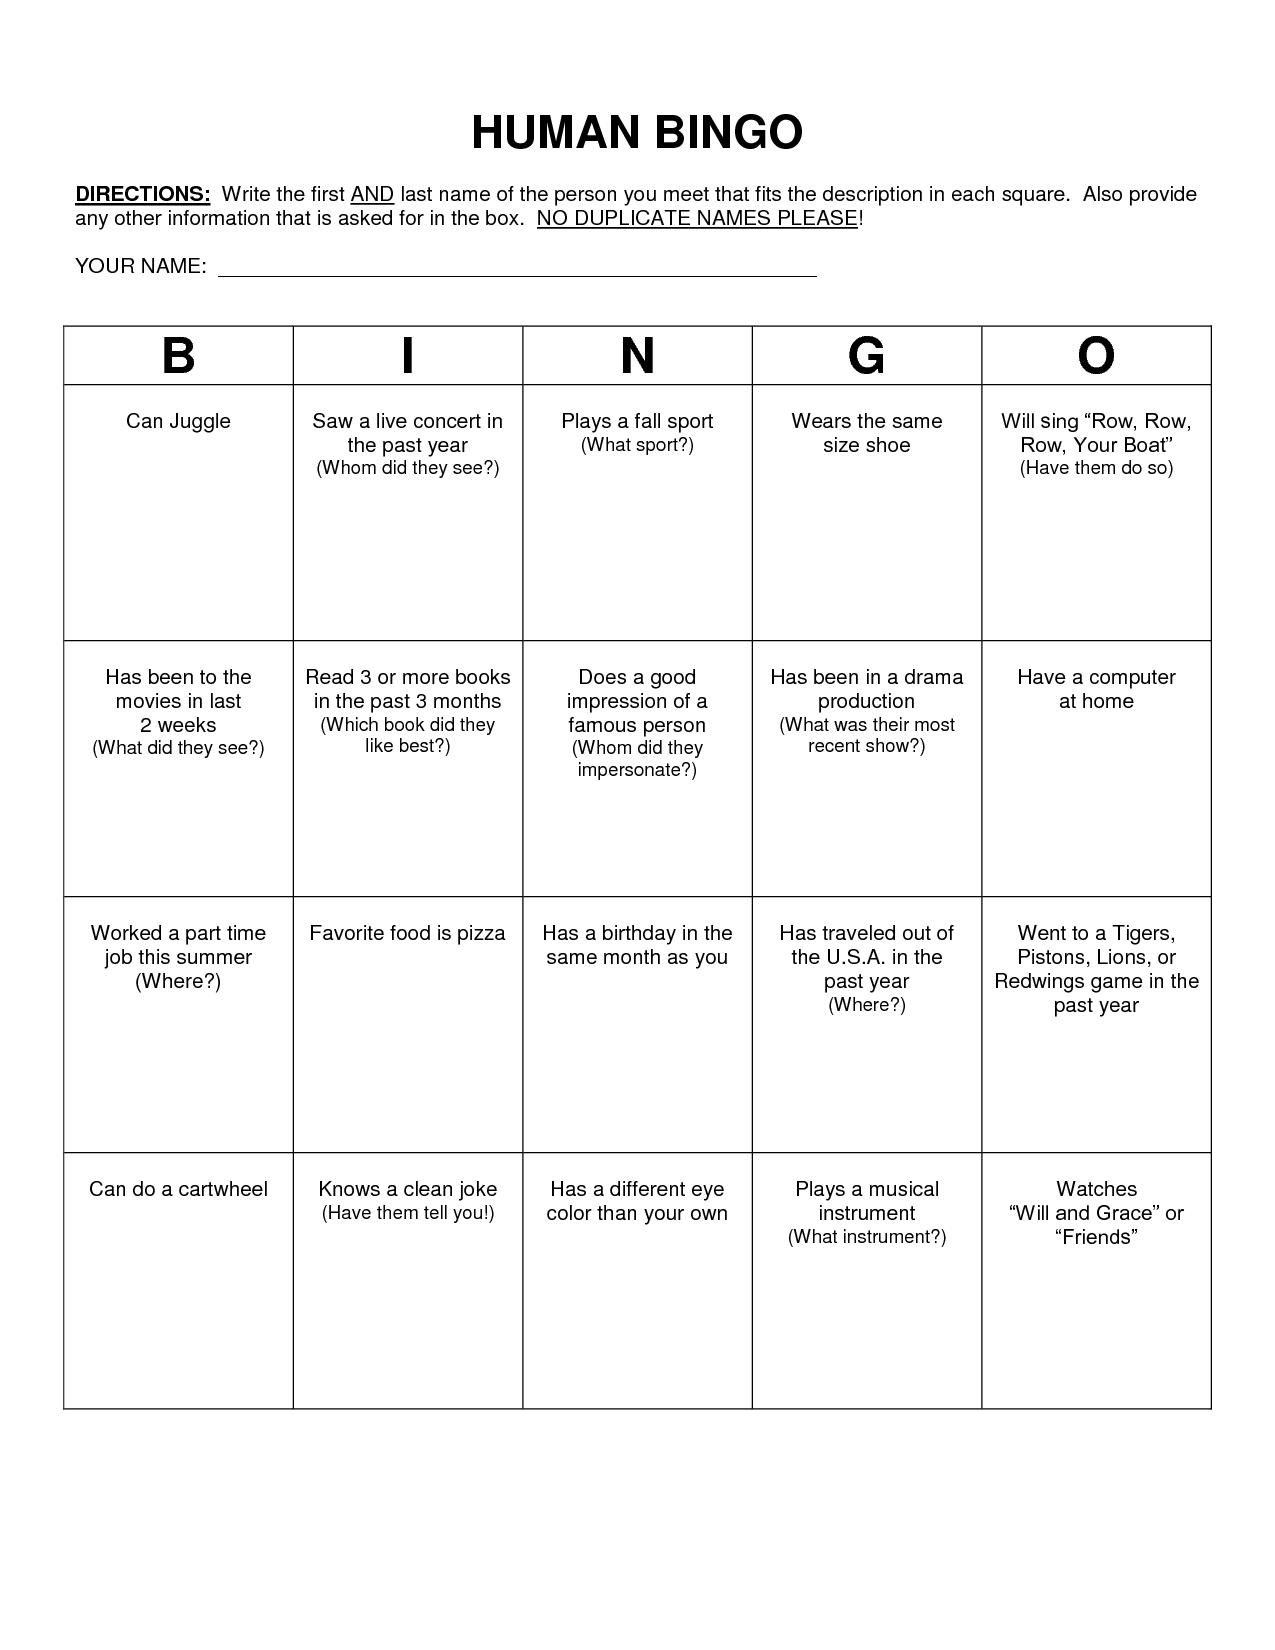 Human Bingo Scavenger Hunt Template